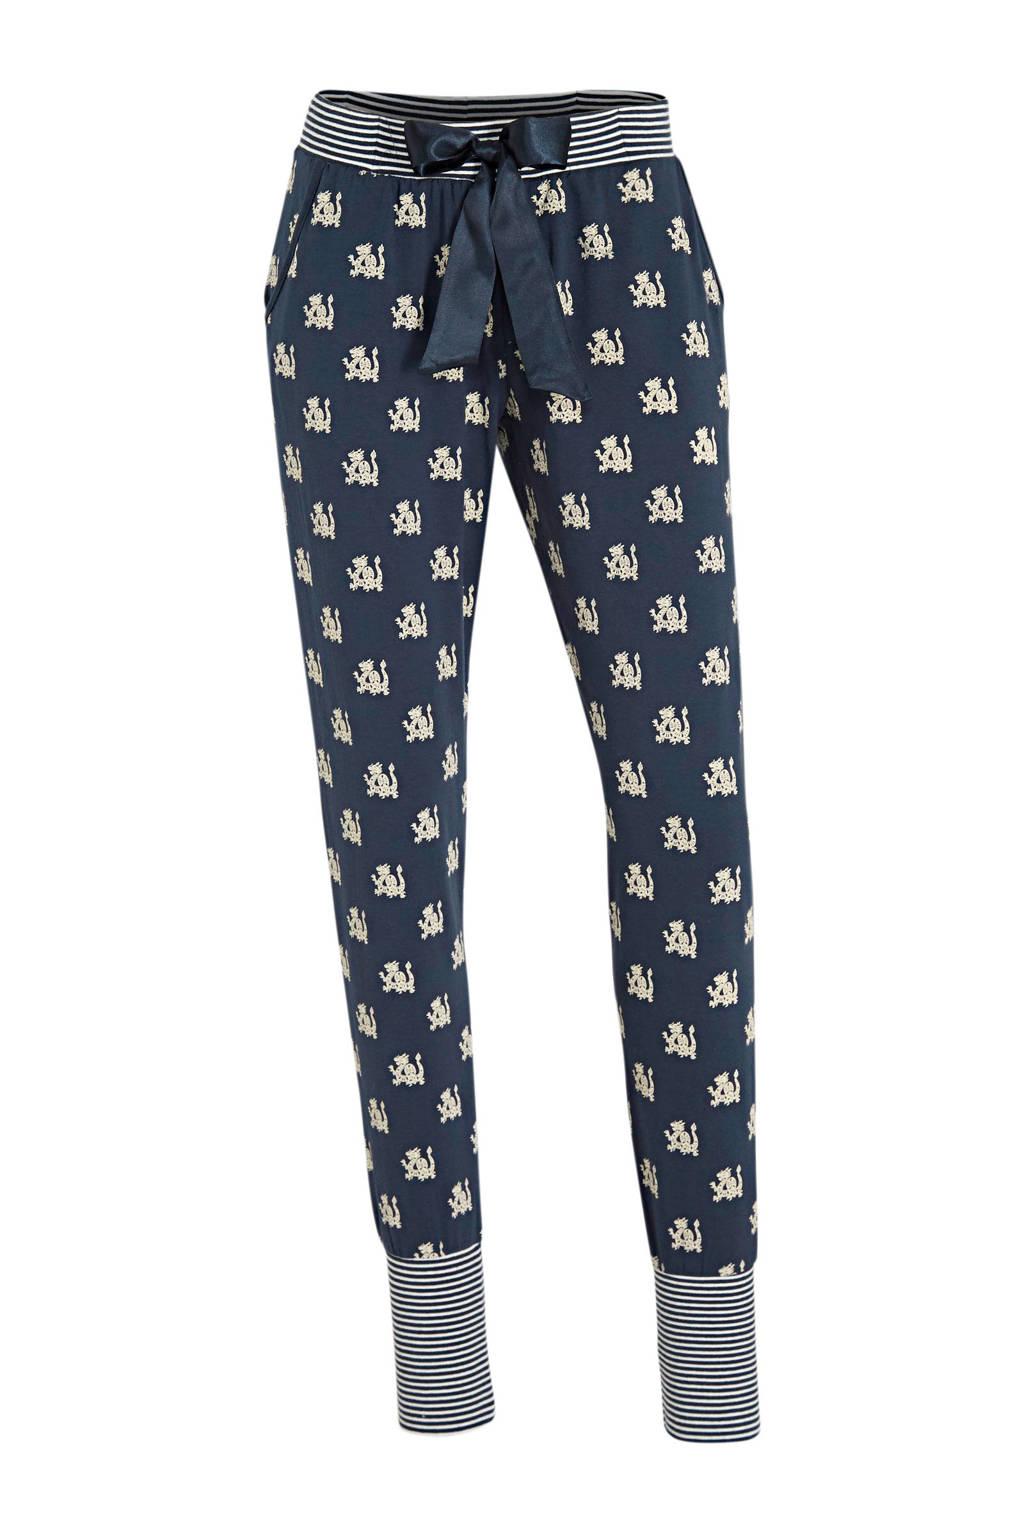 Charlie Choe pyjamabroek met all over print donkerblauw/wit, Donkerblauw/wit